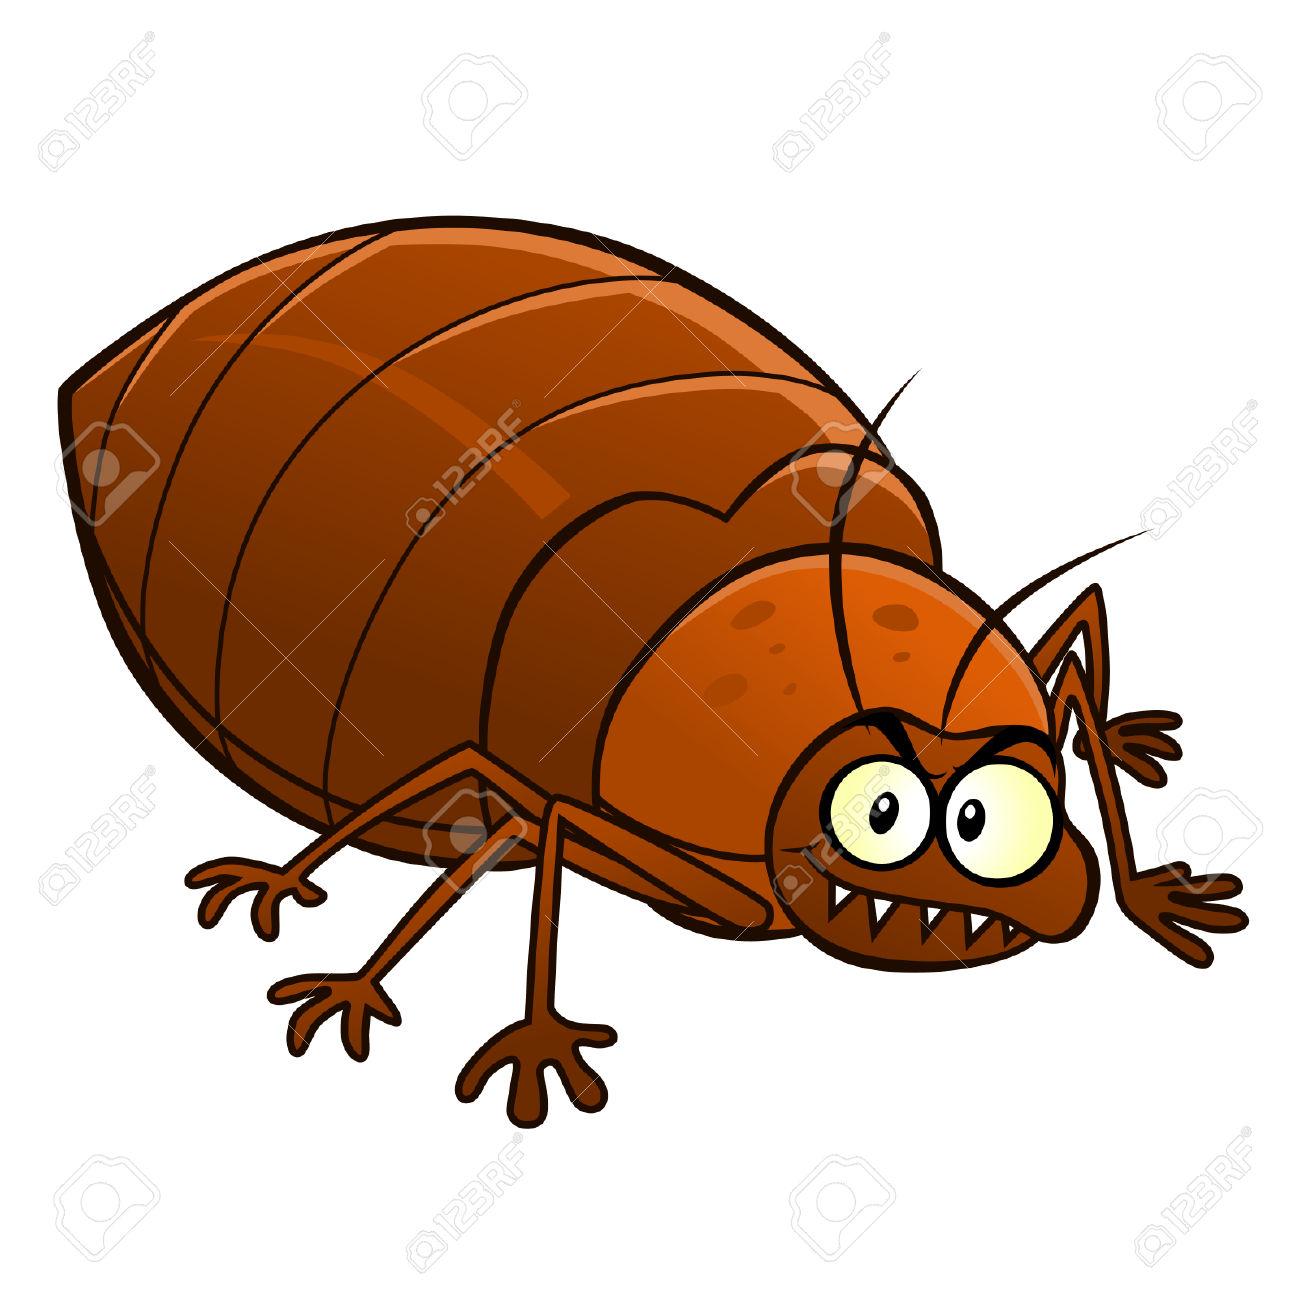 1300x1300 Bugs Clipart Mean 3108163